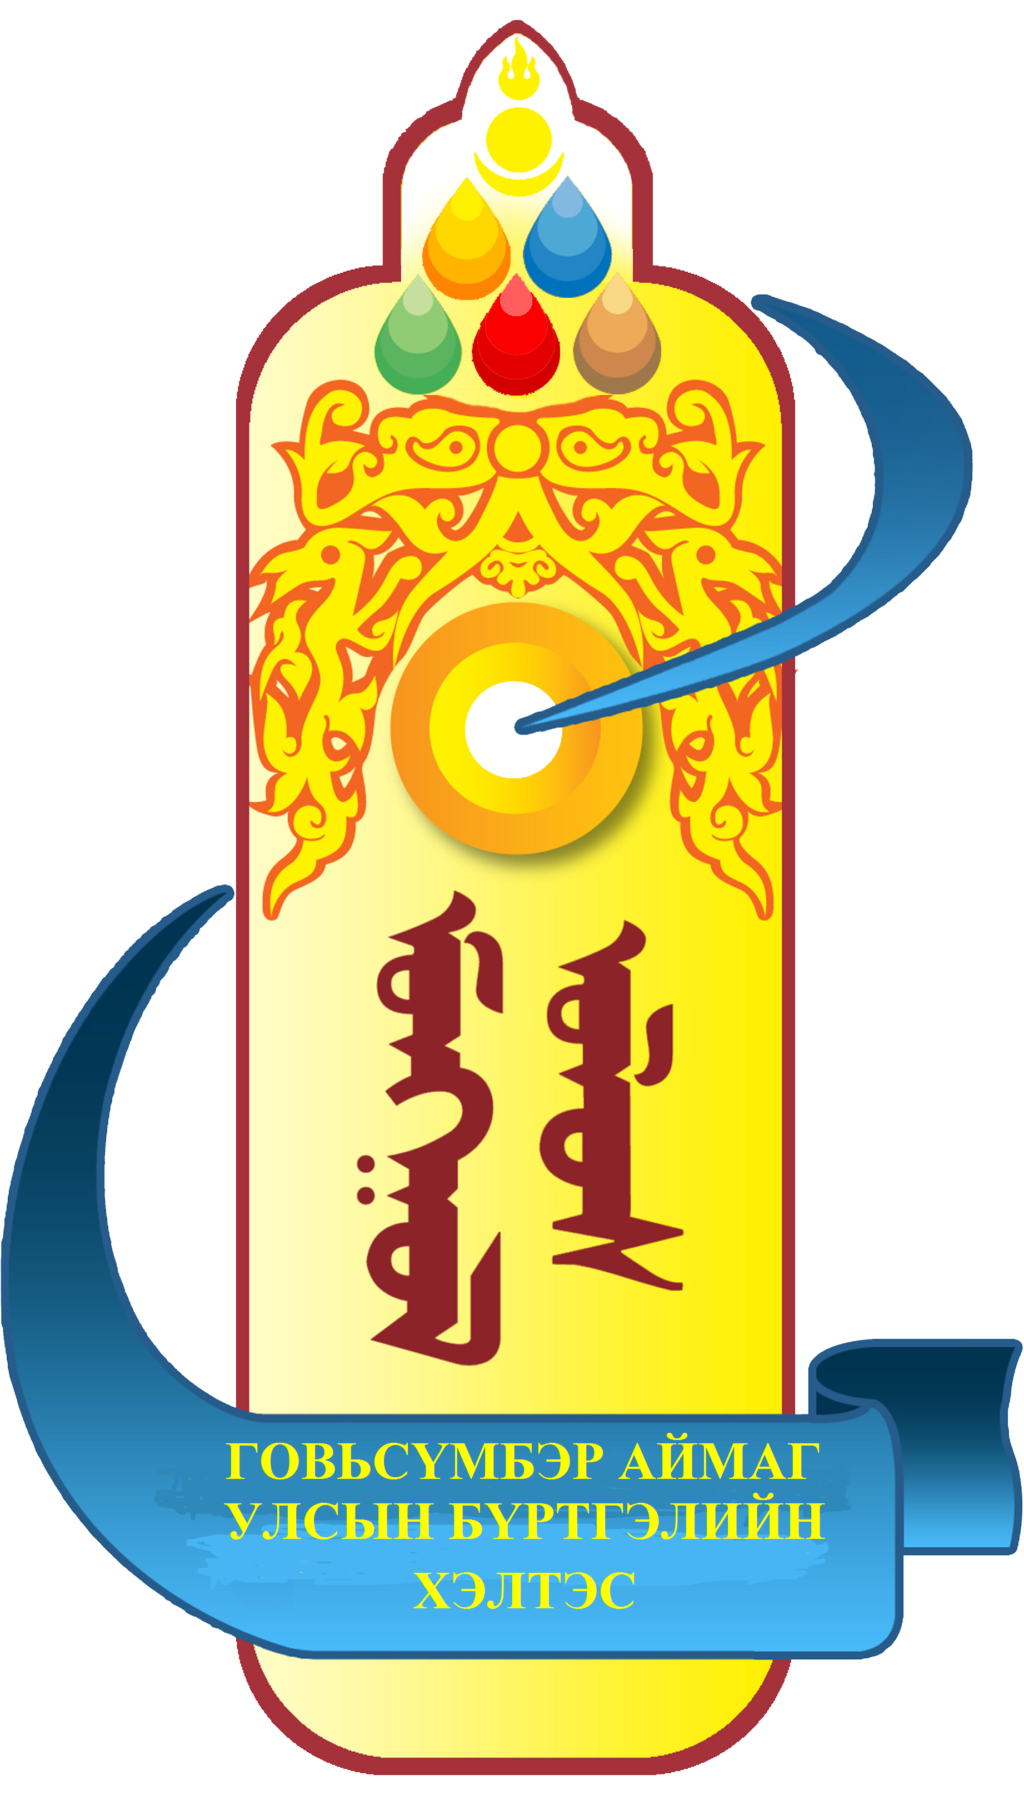 logo_nubg_2017